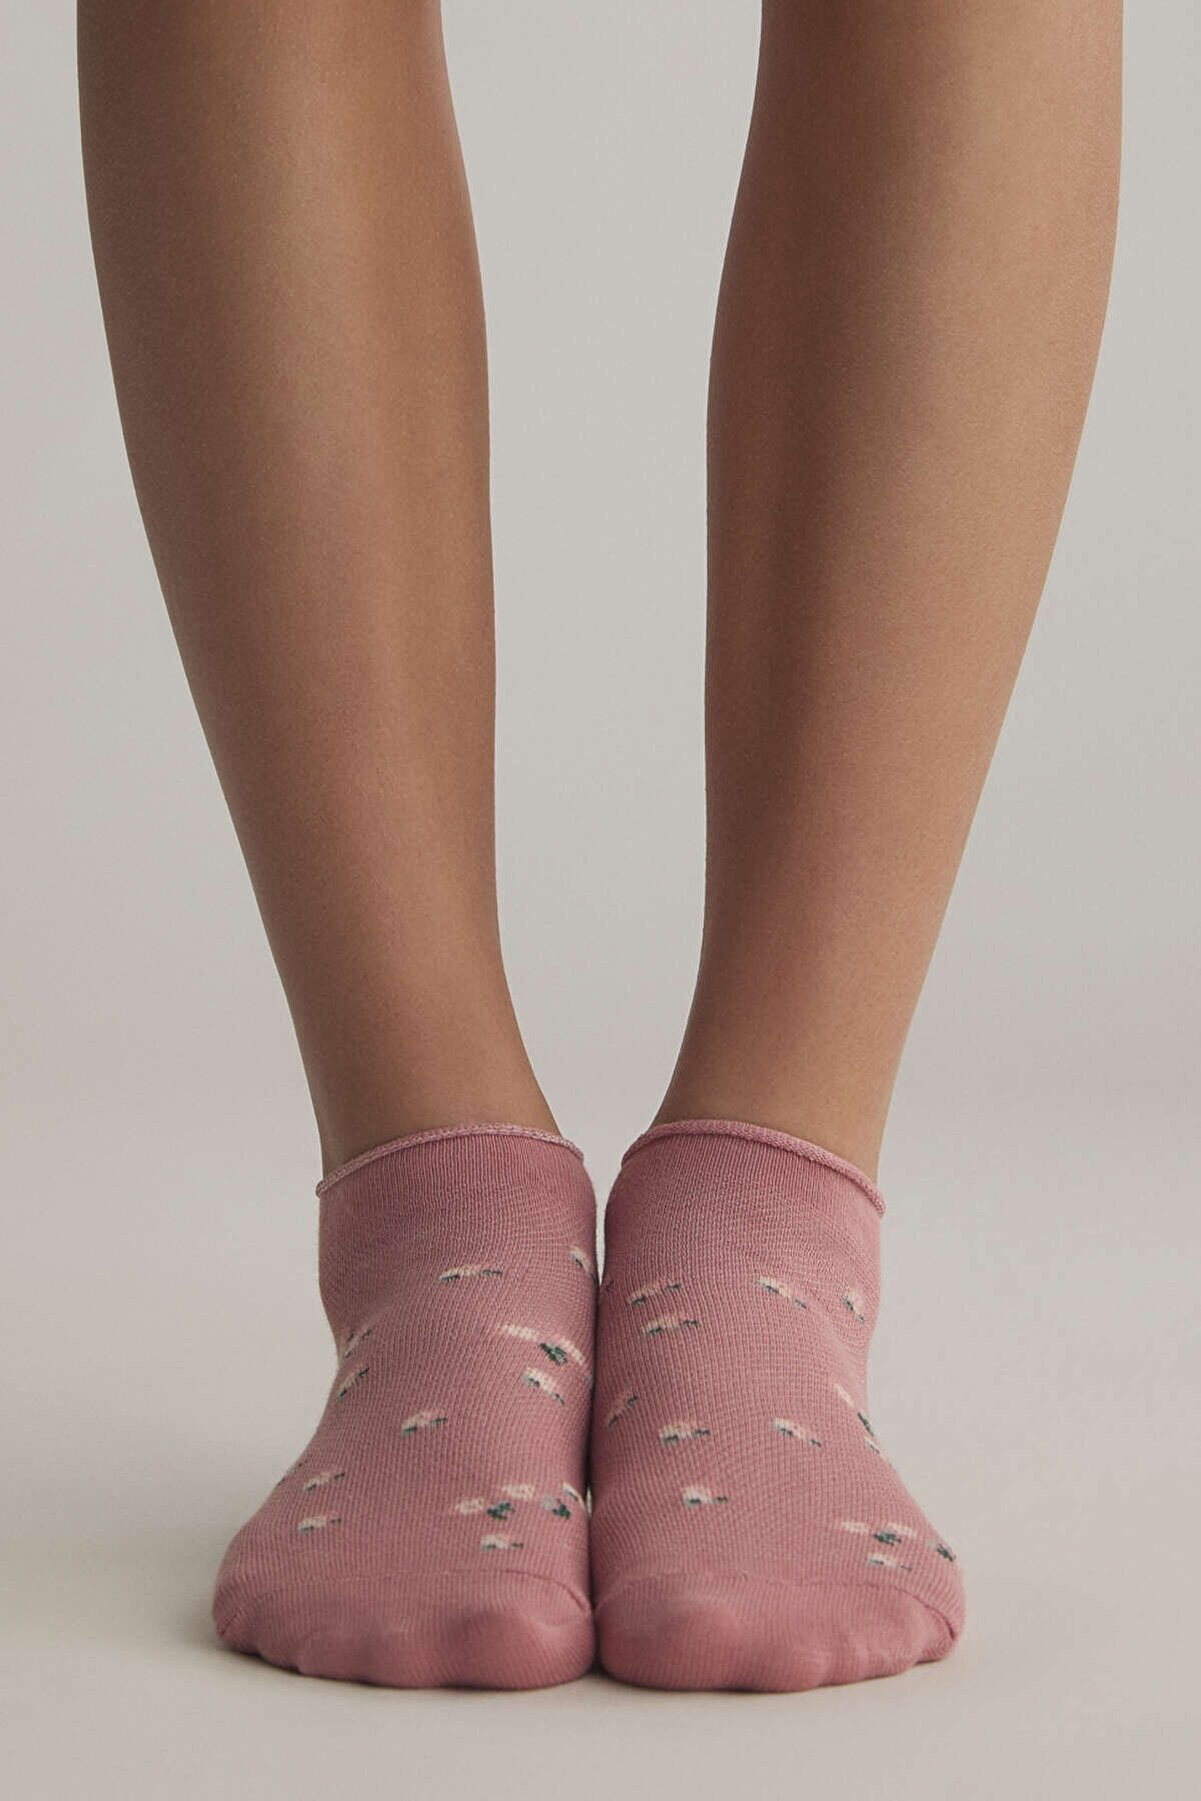 Oysho Kadın Pamuklu Bilek Boyu Çorap 5 Çift